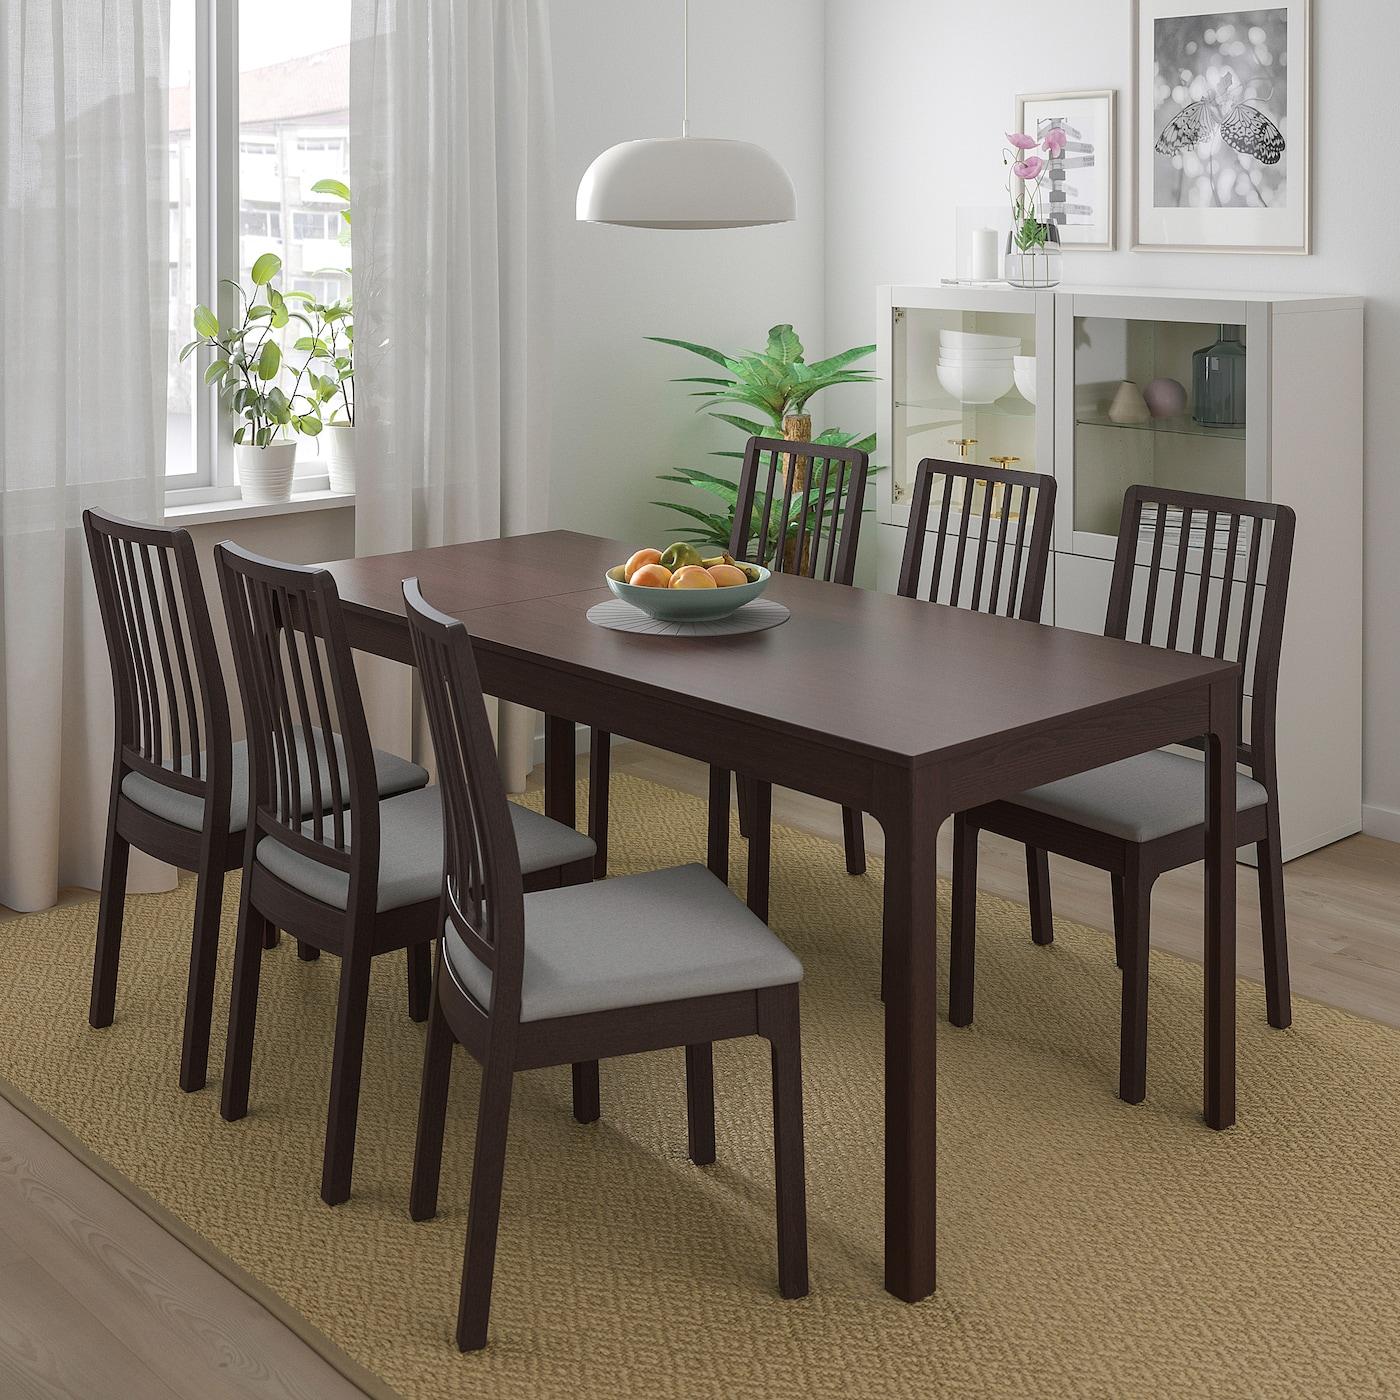 Ekedalen Dark Brown Extendable Table Min Length 120 Cm Ikea